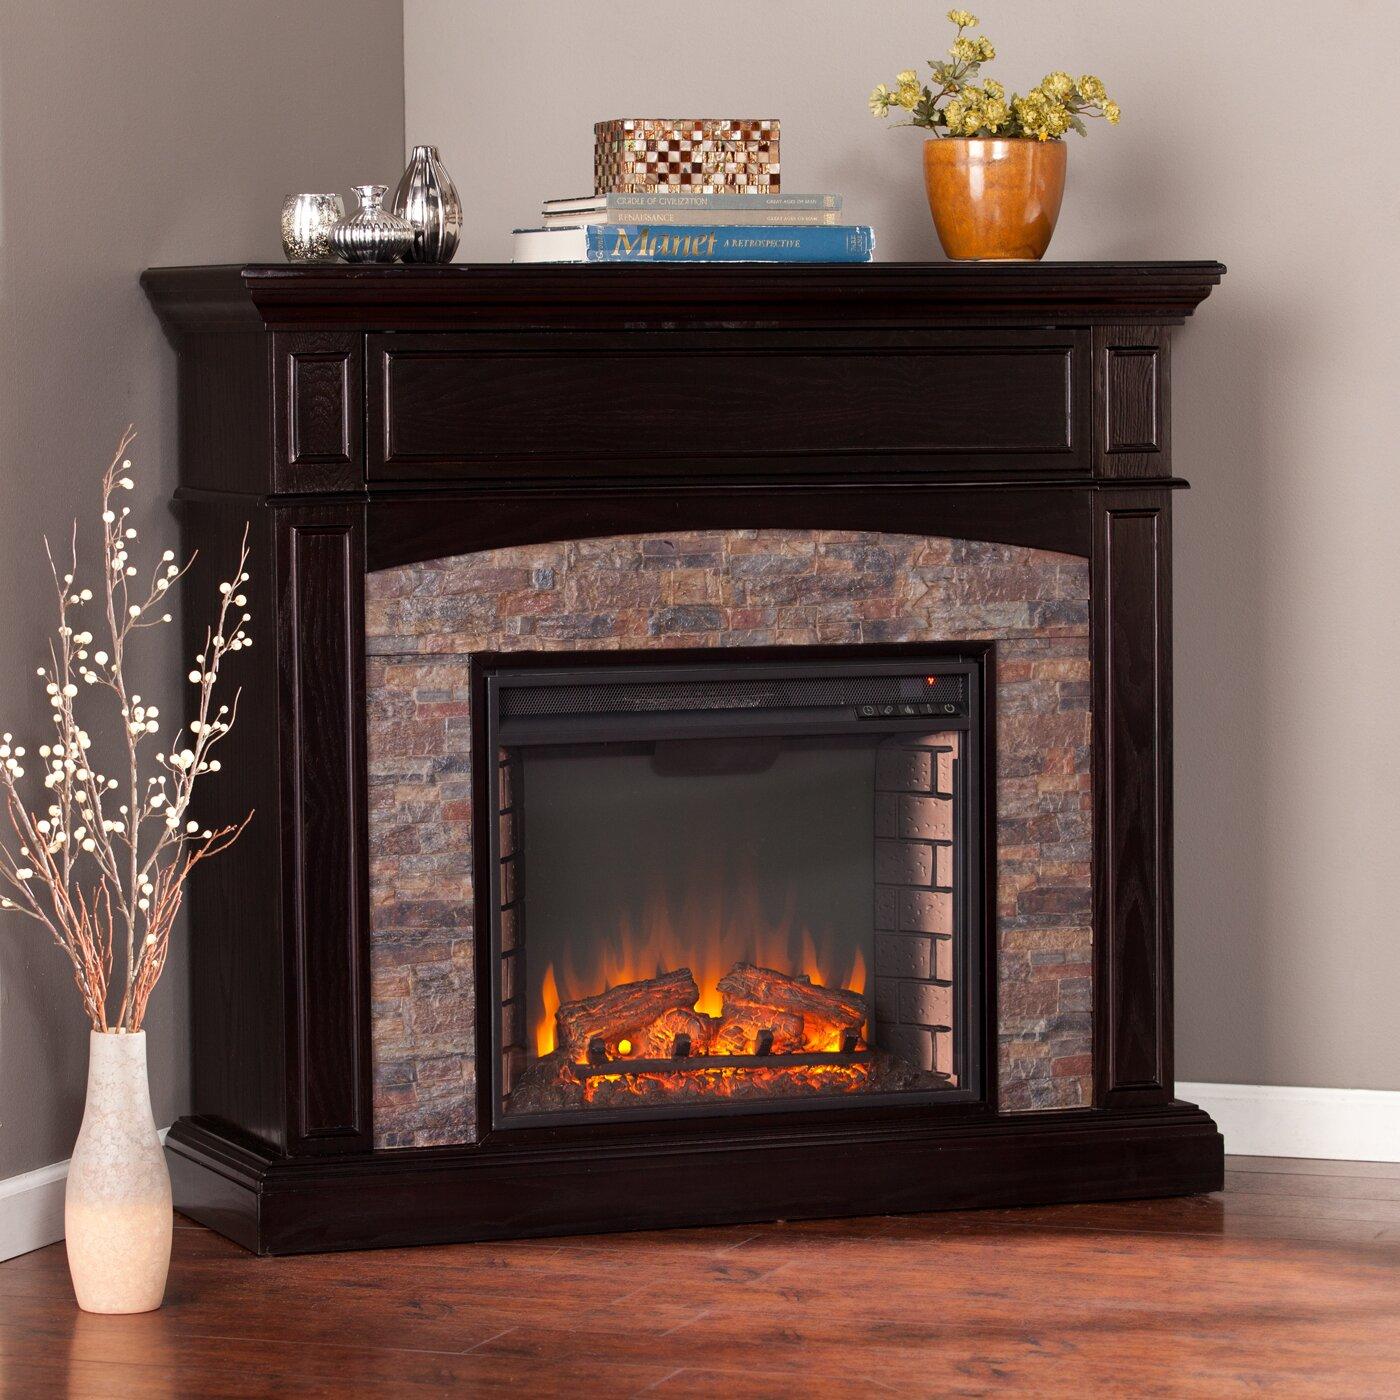 Alcott Hill® Drumbare Corner Electric Fireplace - Alcott Hill Drumbare Corner Electric Fireplace & Reviews Wayfair